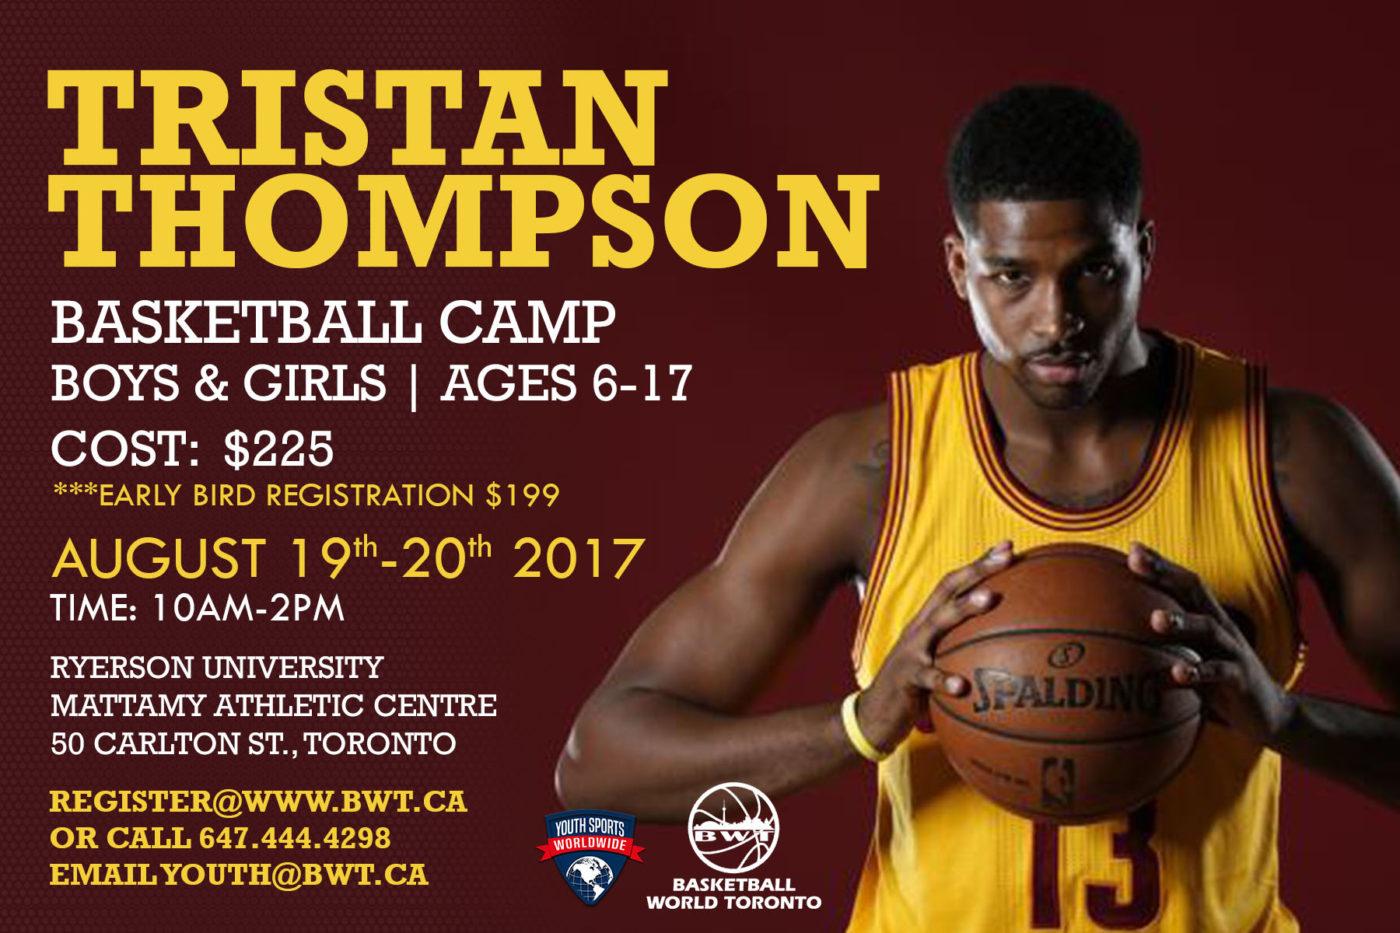 Tristan Thompson Basketball Camp August 19th-20th, 2017